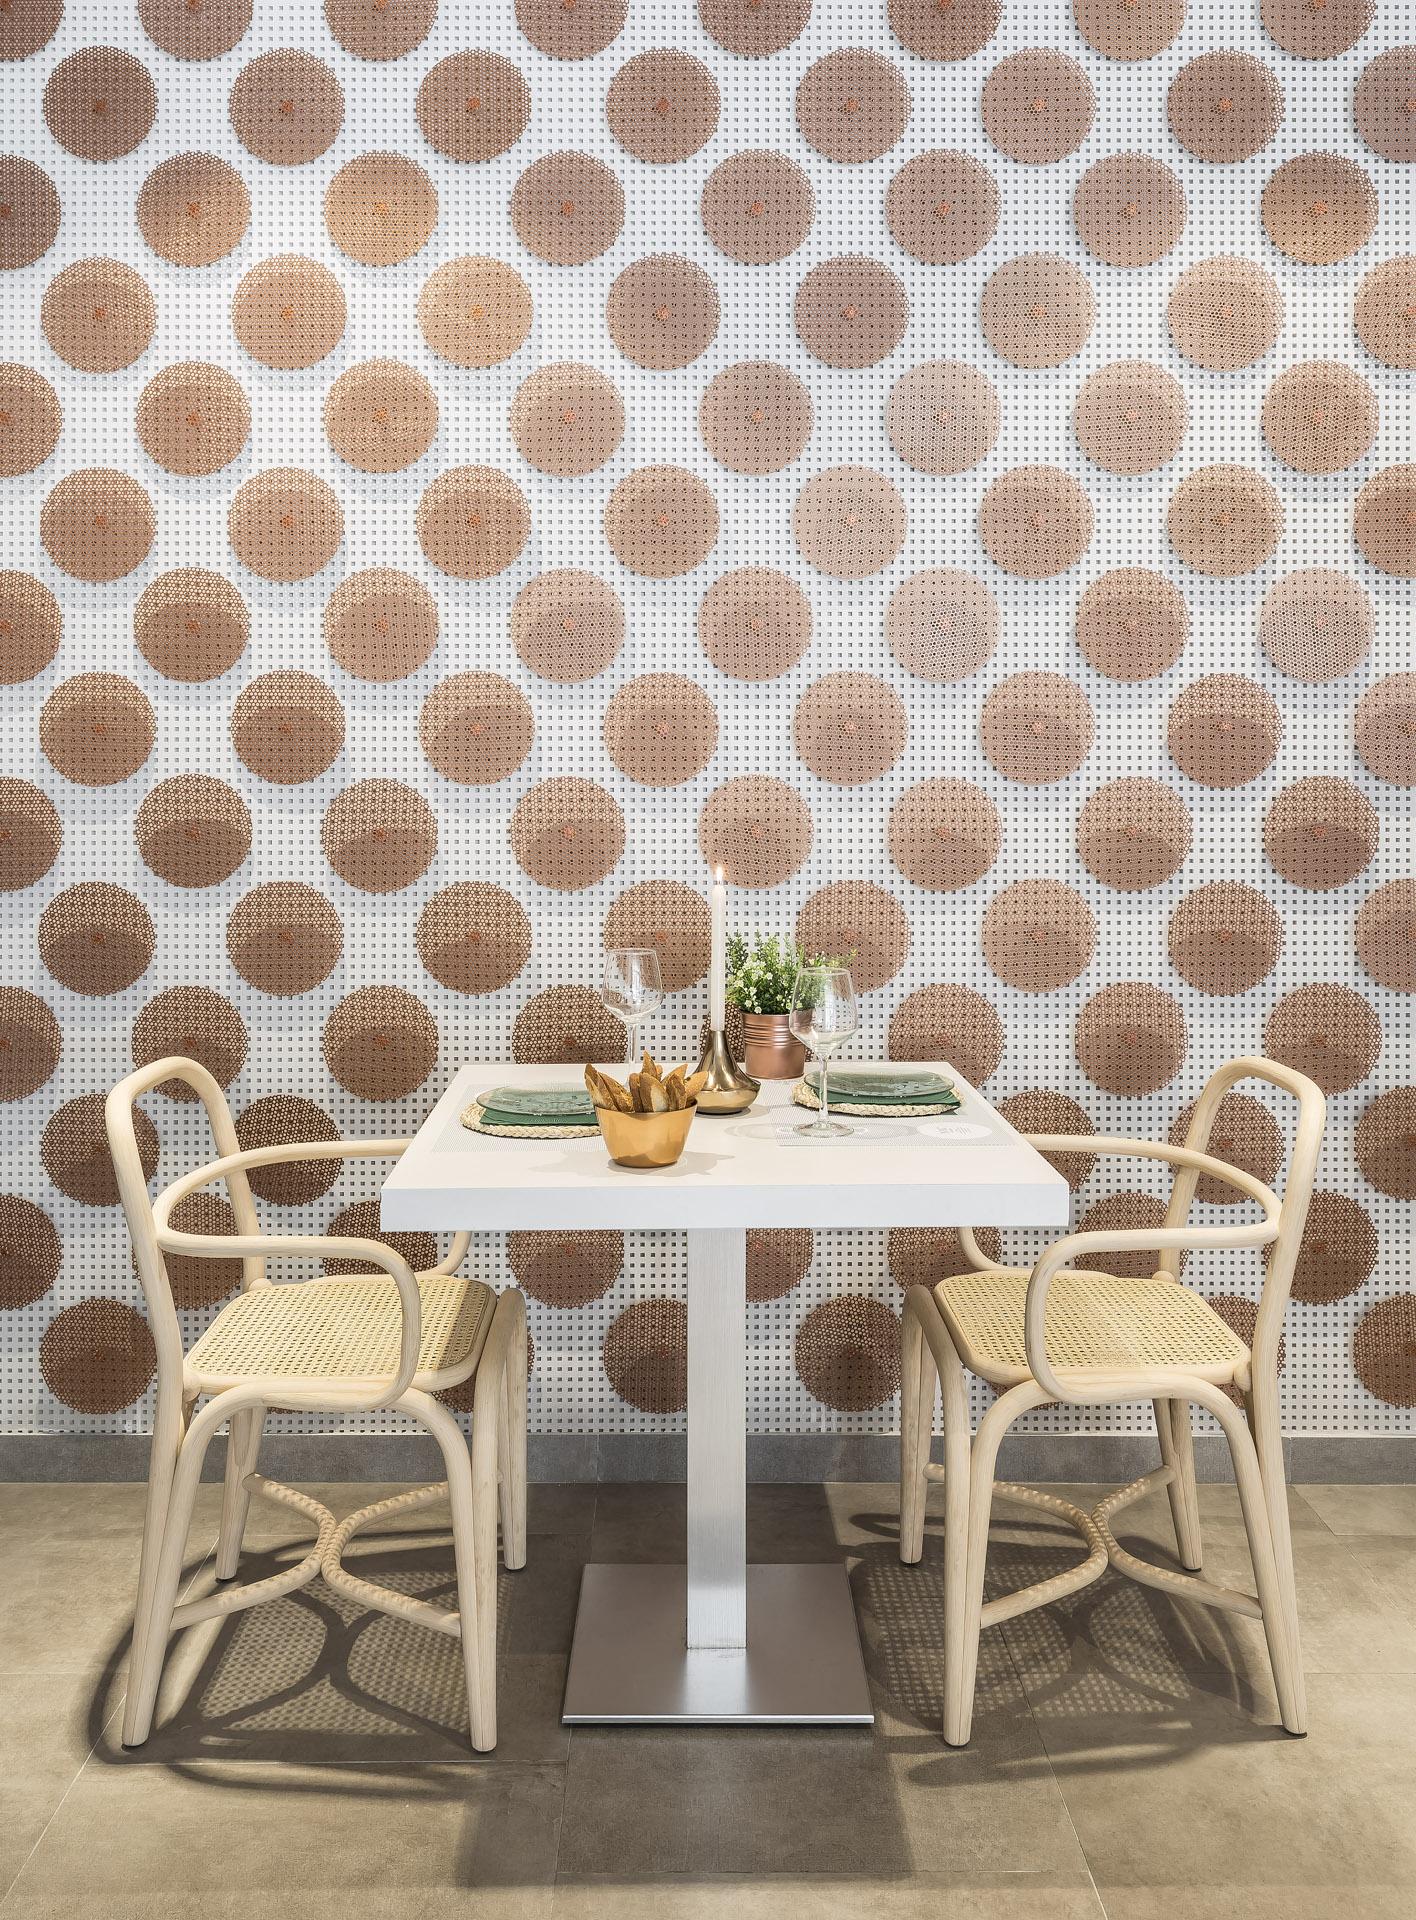 fotografia-arquitectura-valencia-german-cabo-estudihac-restaurante-nac-ontinyent-17